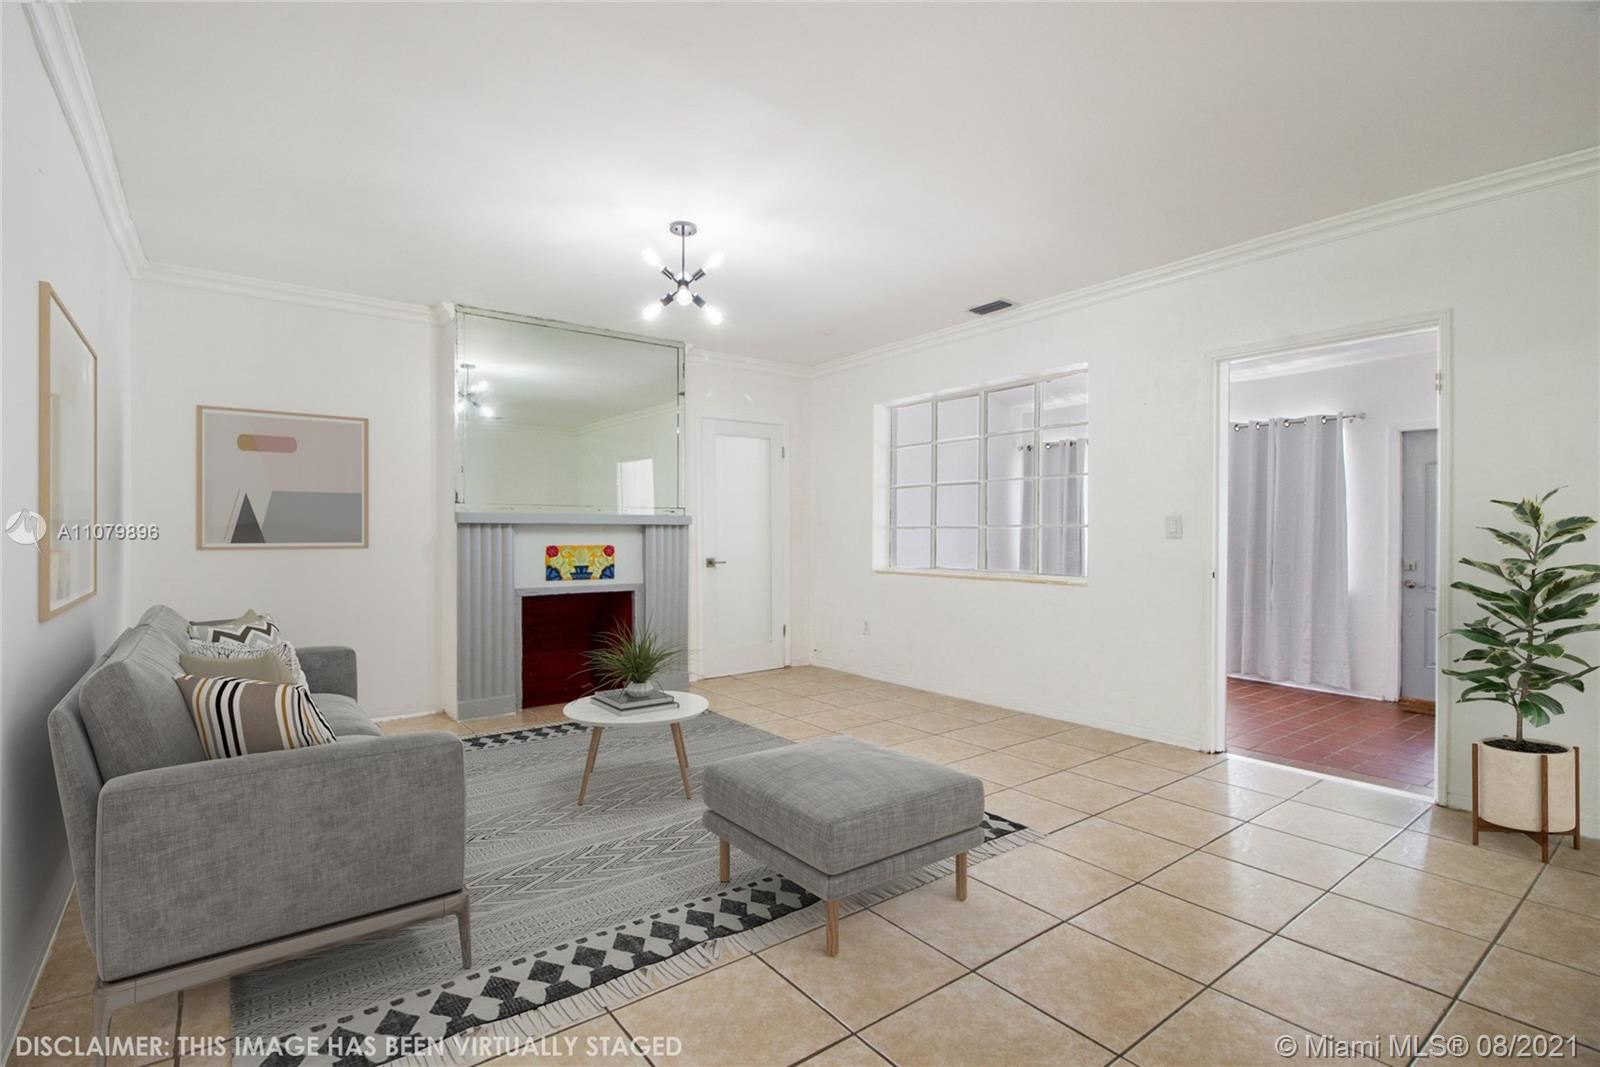 2420 SW 22nd Ave, Miami, FL 33145 - #: A11079896